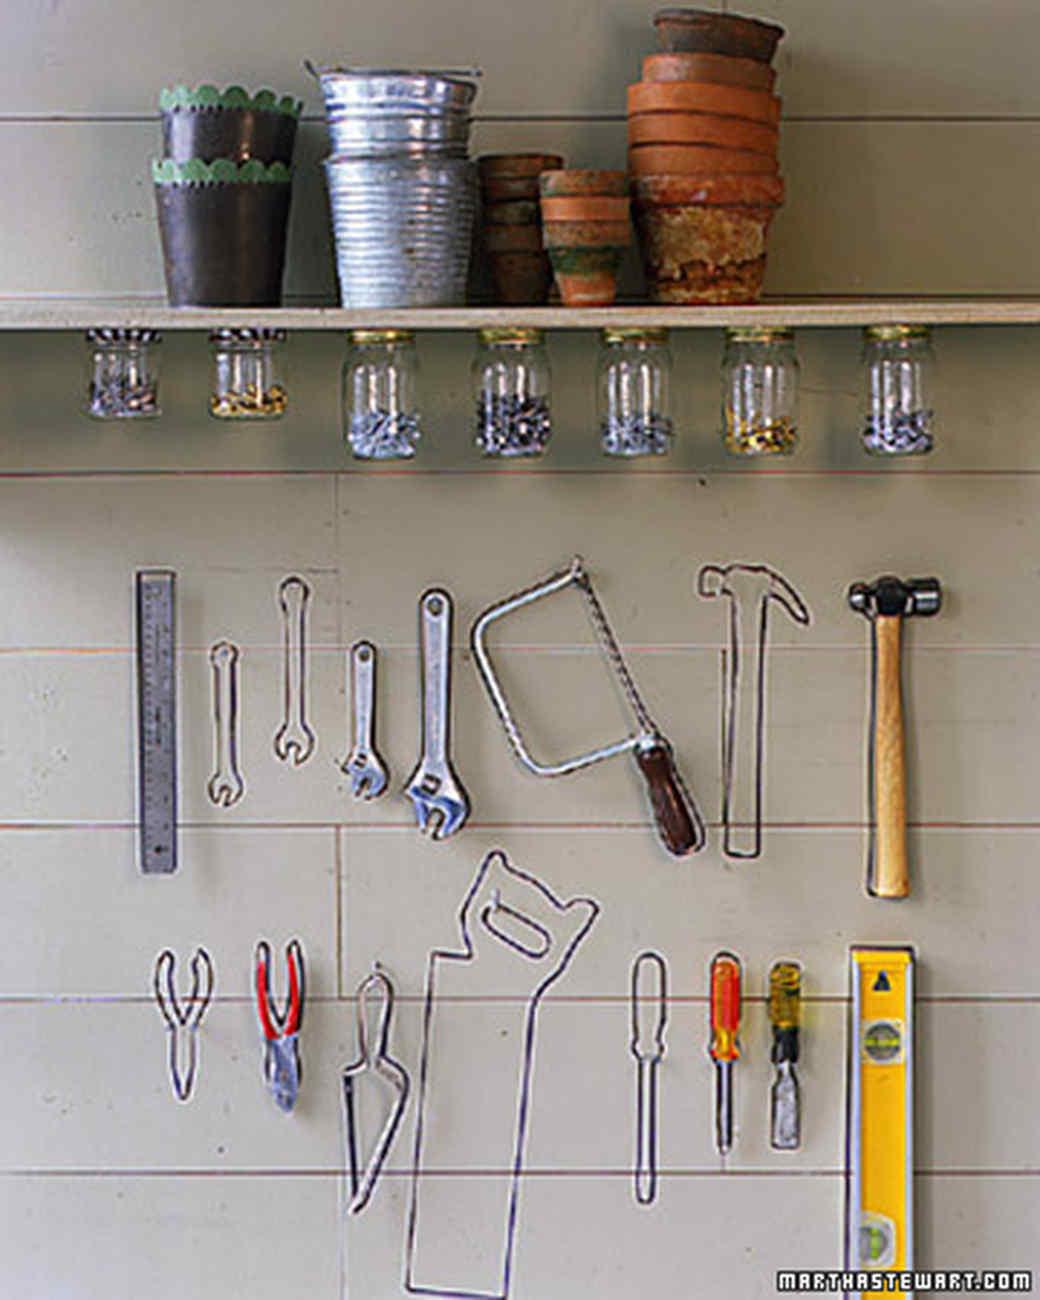 12 essential laundryroom organizing ideas - Laundry Storage Ideas